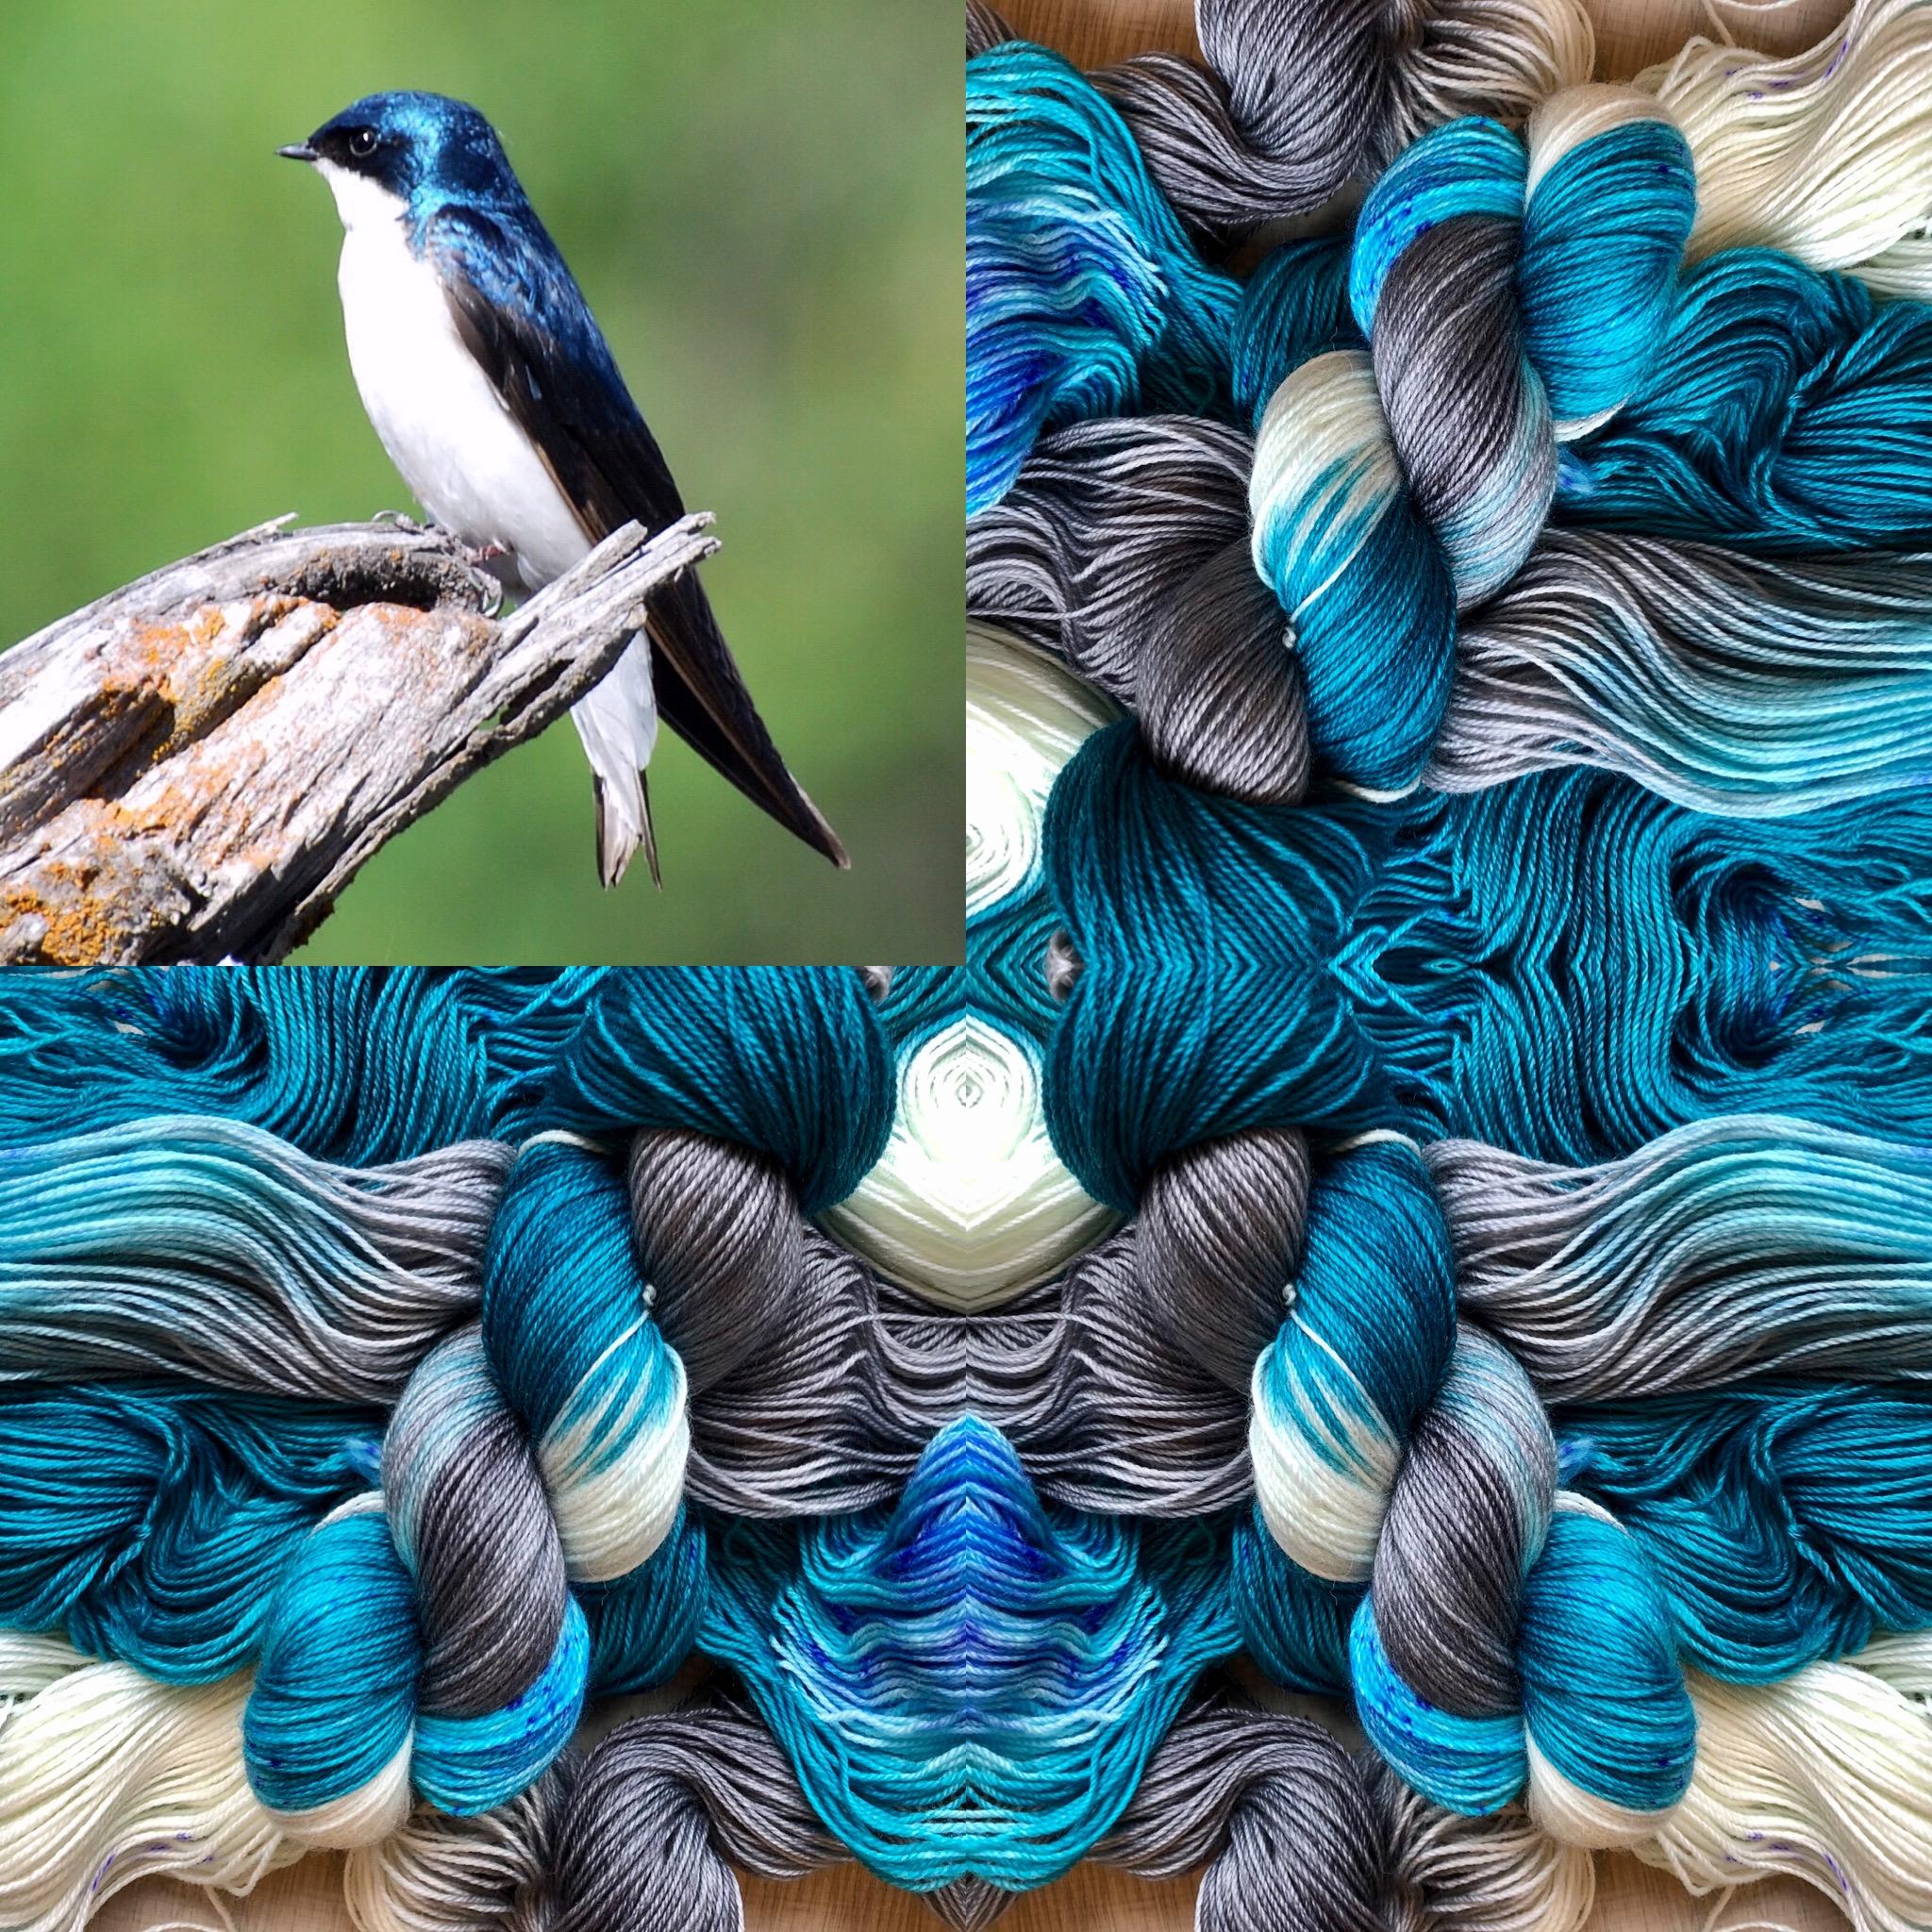 Songbird Yarn and Fibres